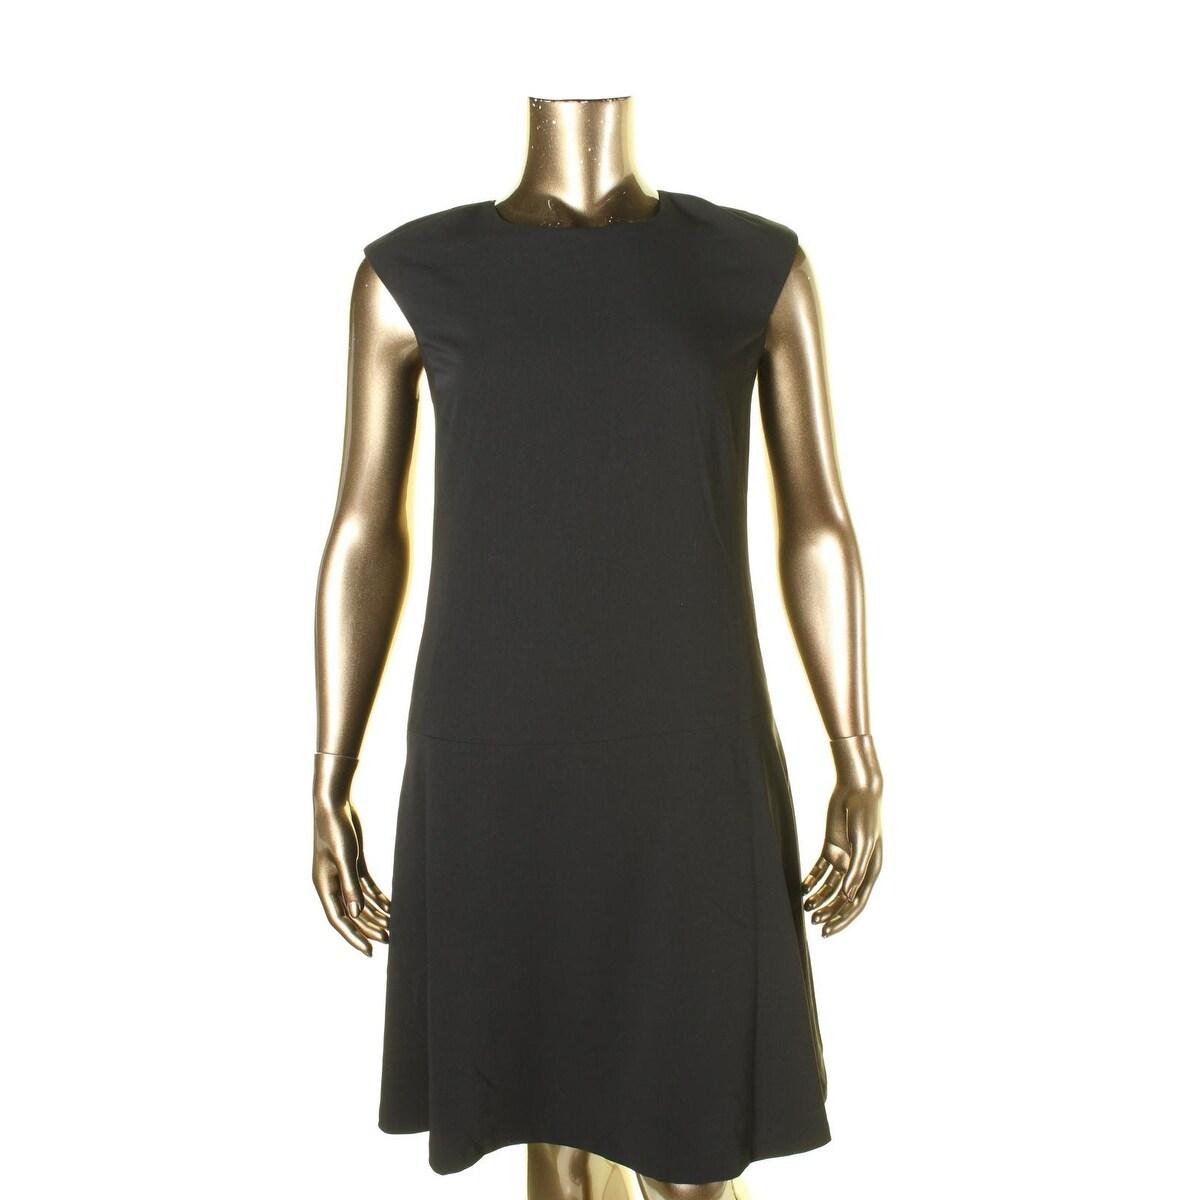 Lauren Ralph Lauren Womens Cocktail Dress Hidden Back Zipper Crew ...